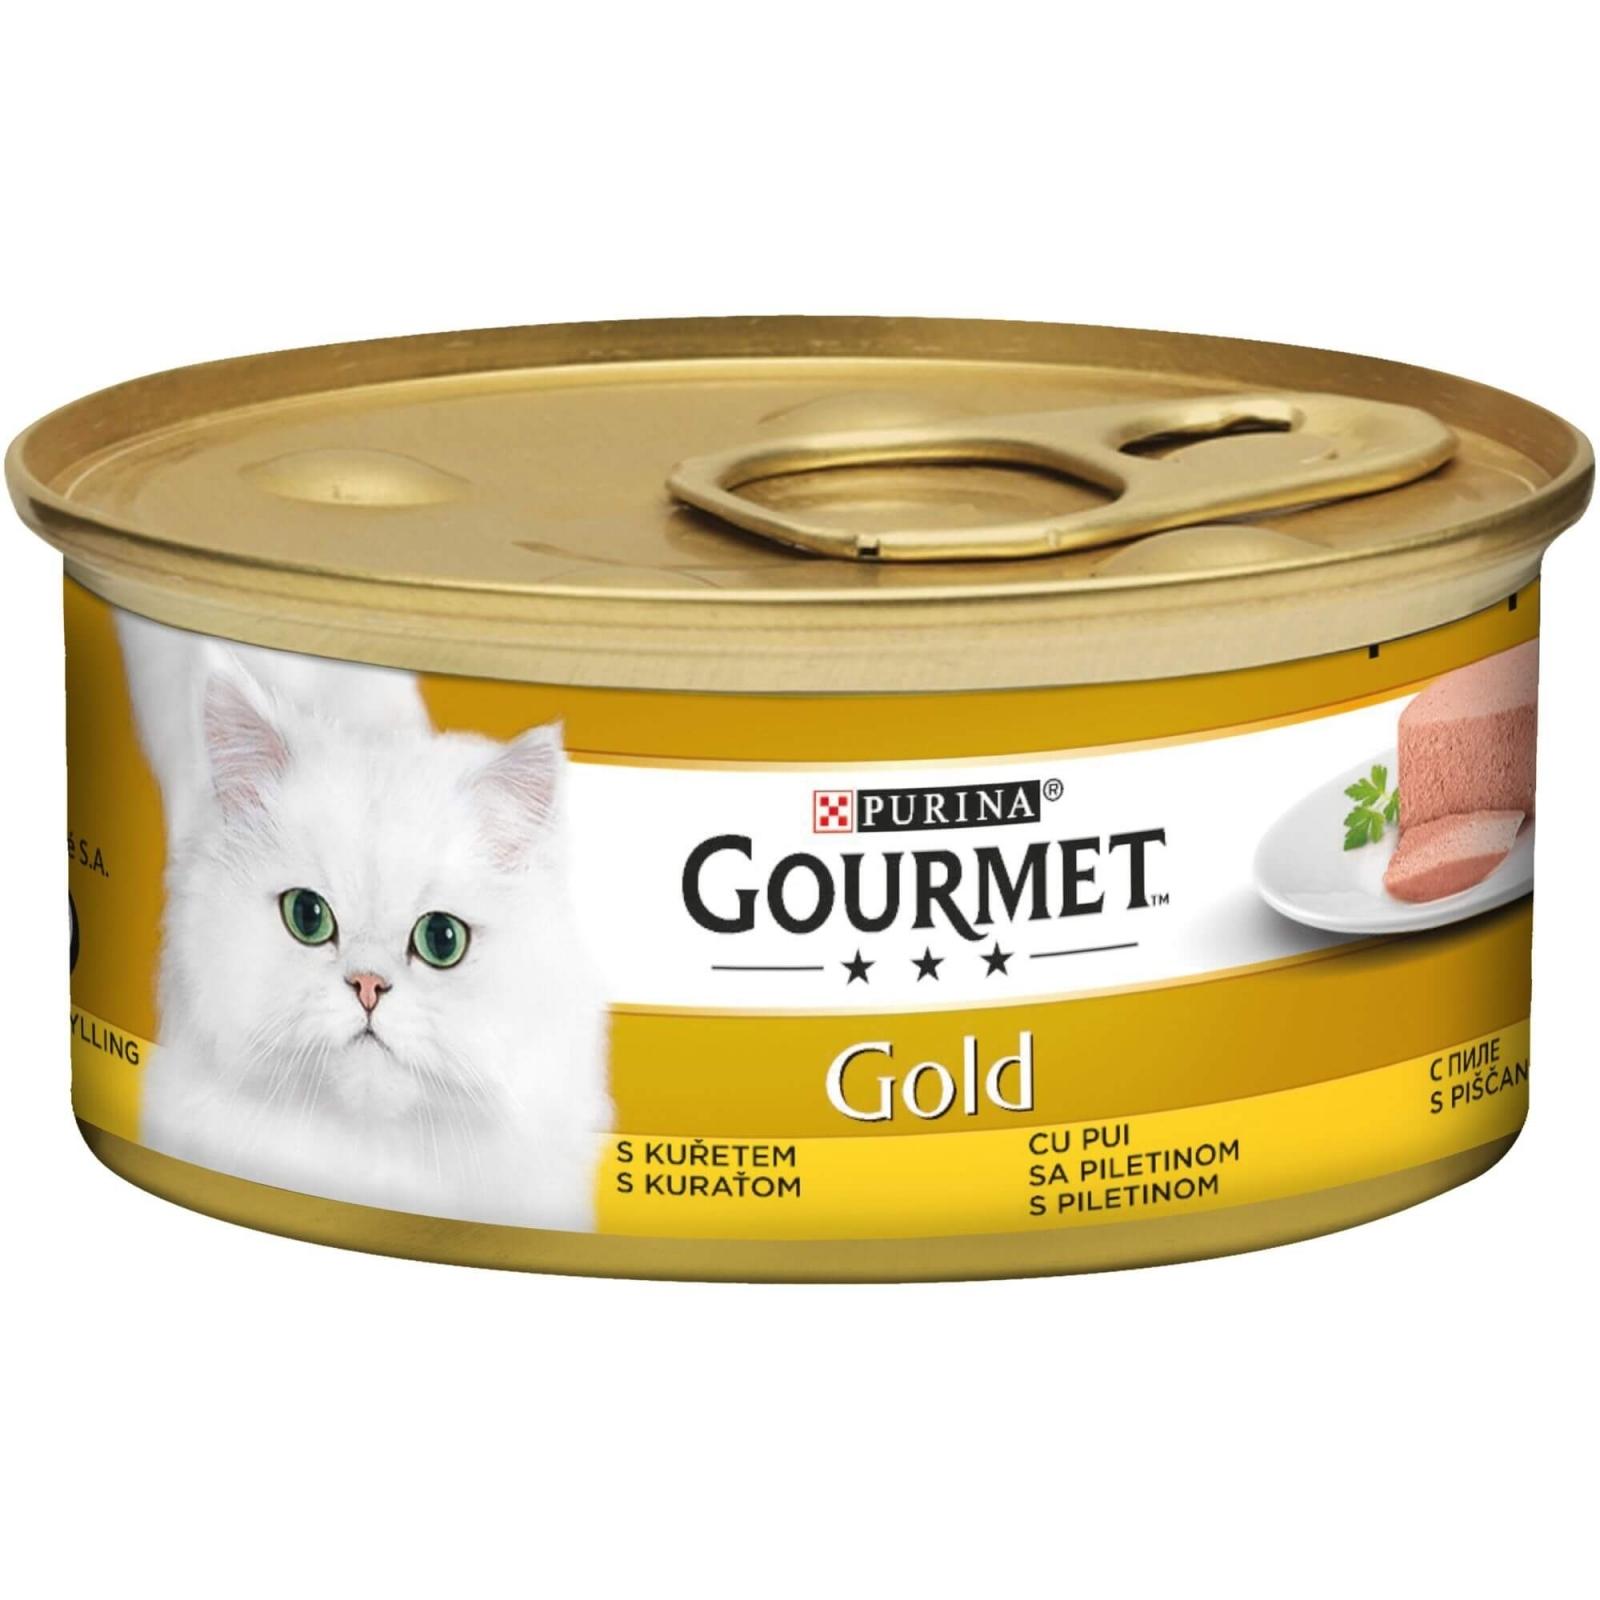 Gourmet Gold Mousse cu Pui, 85 g imagine